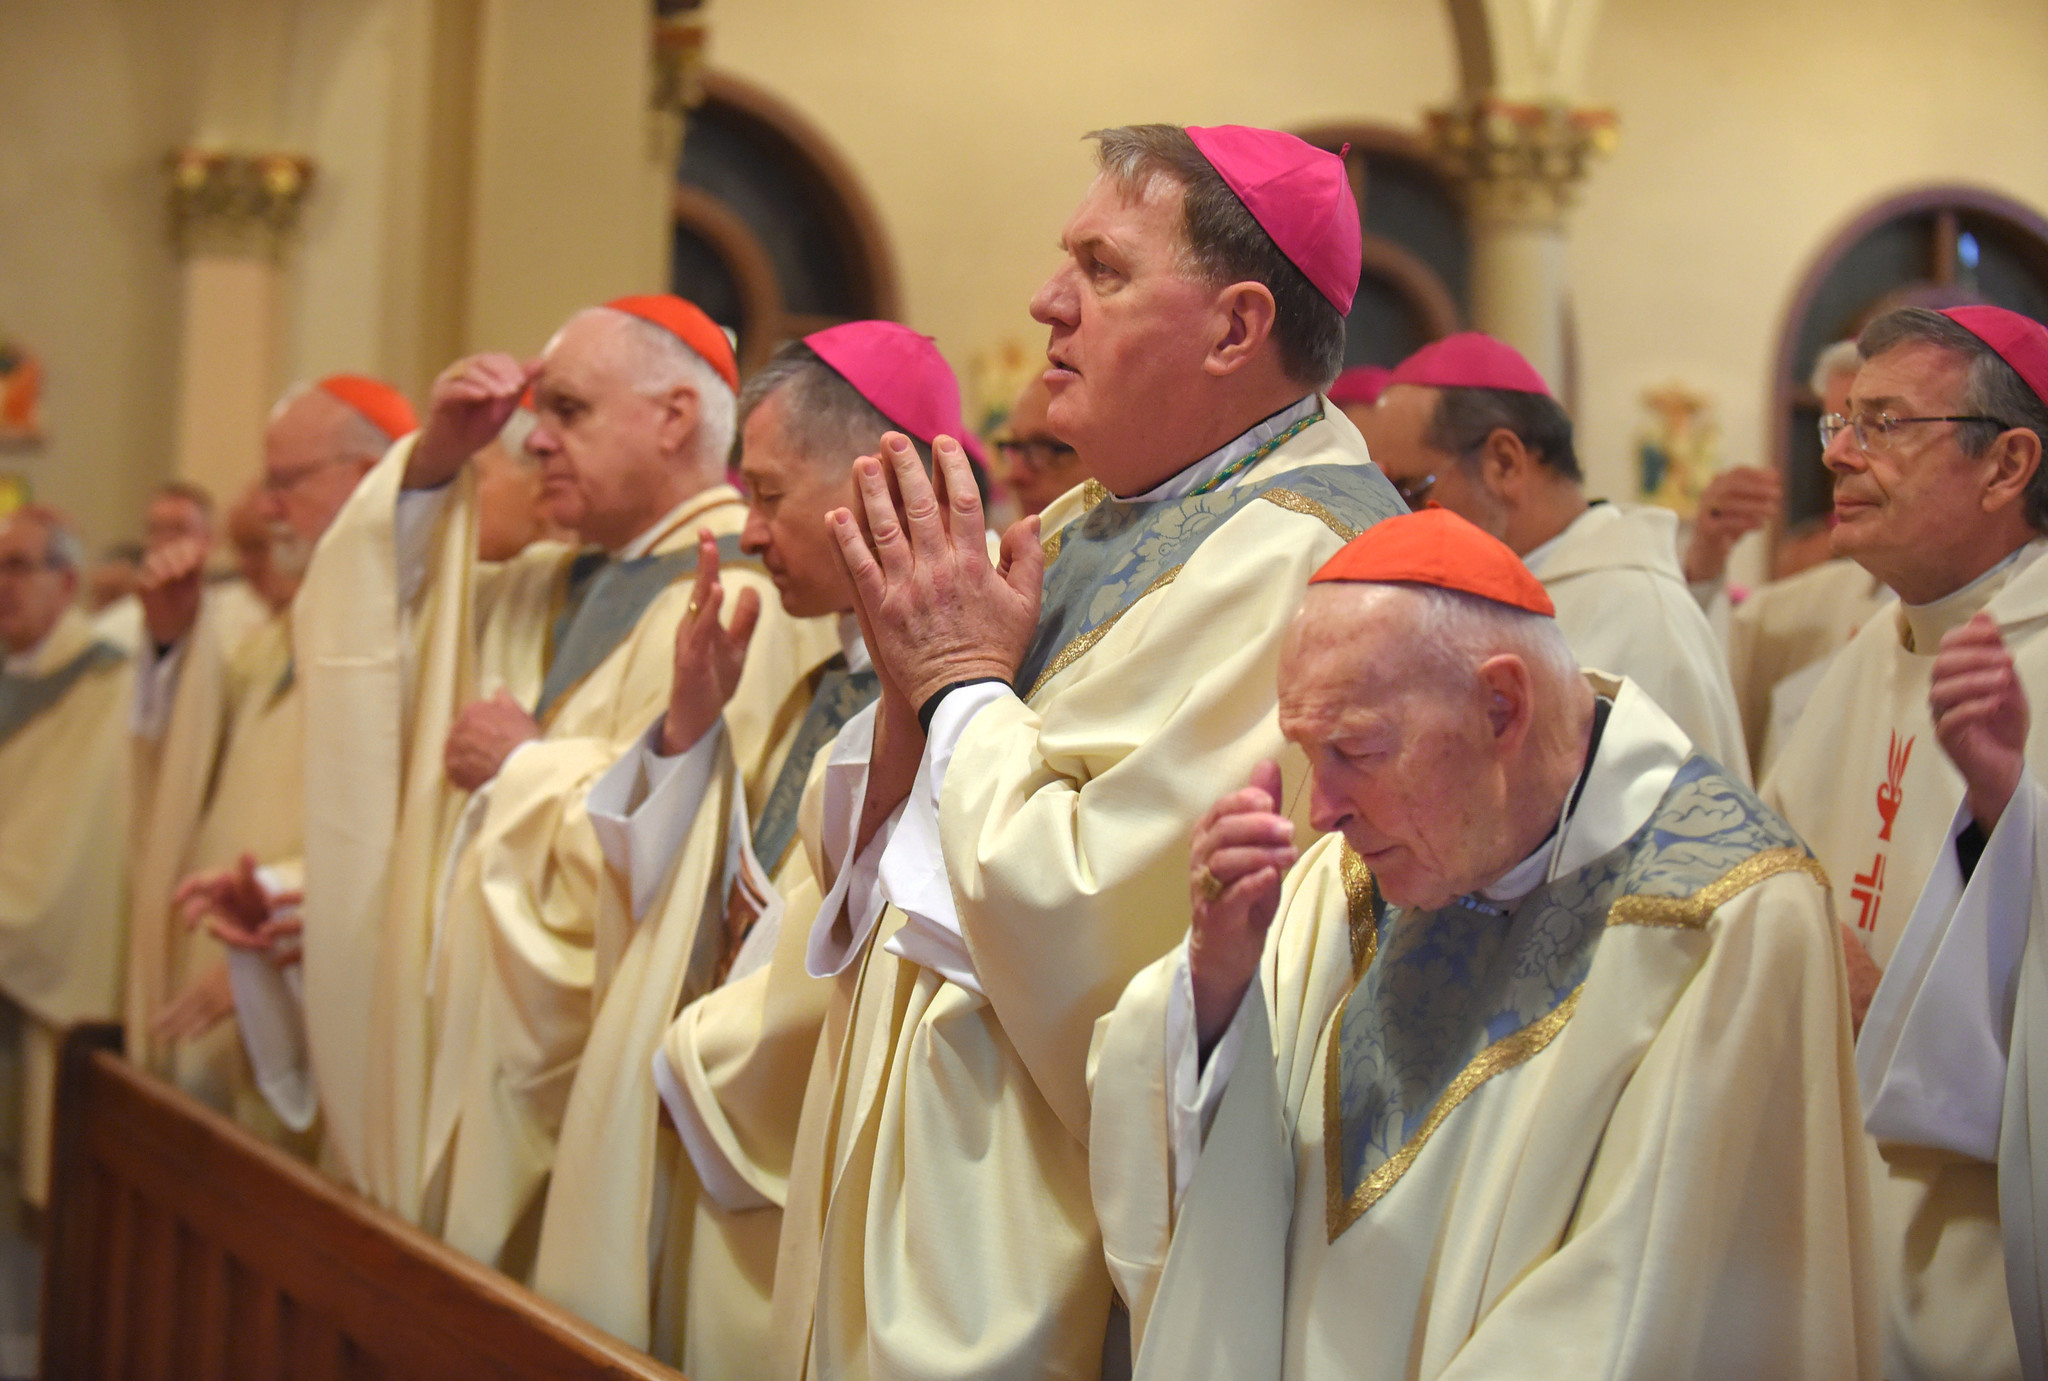 catholic bishops  meeting in baltimore  congratulate trump